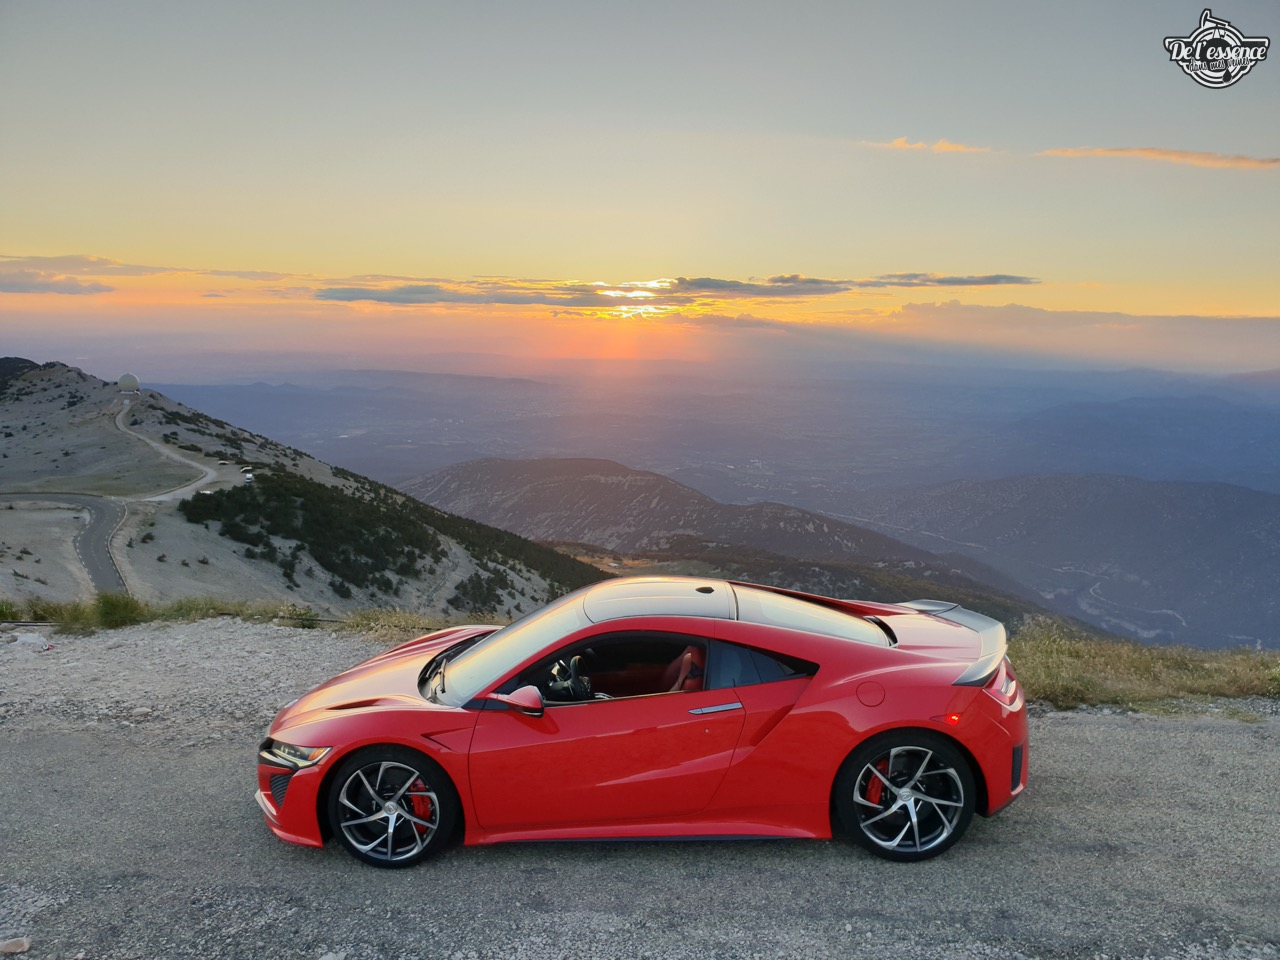 Honda NSX 2017 - Je me souviens... 74